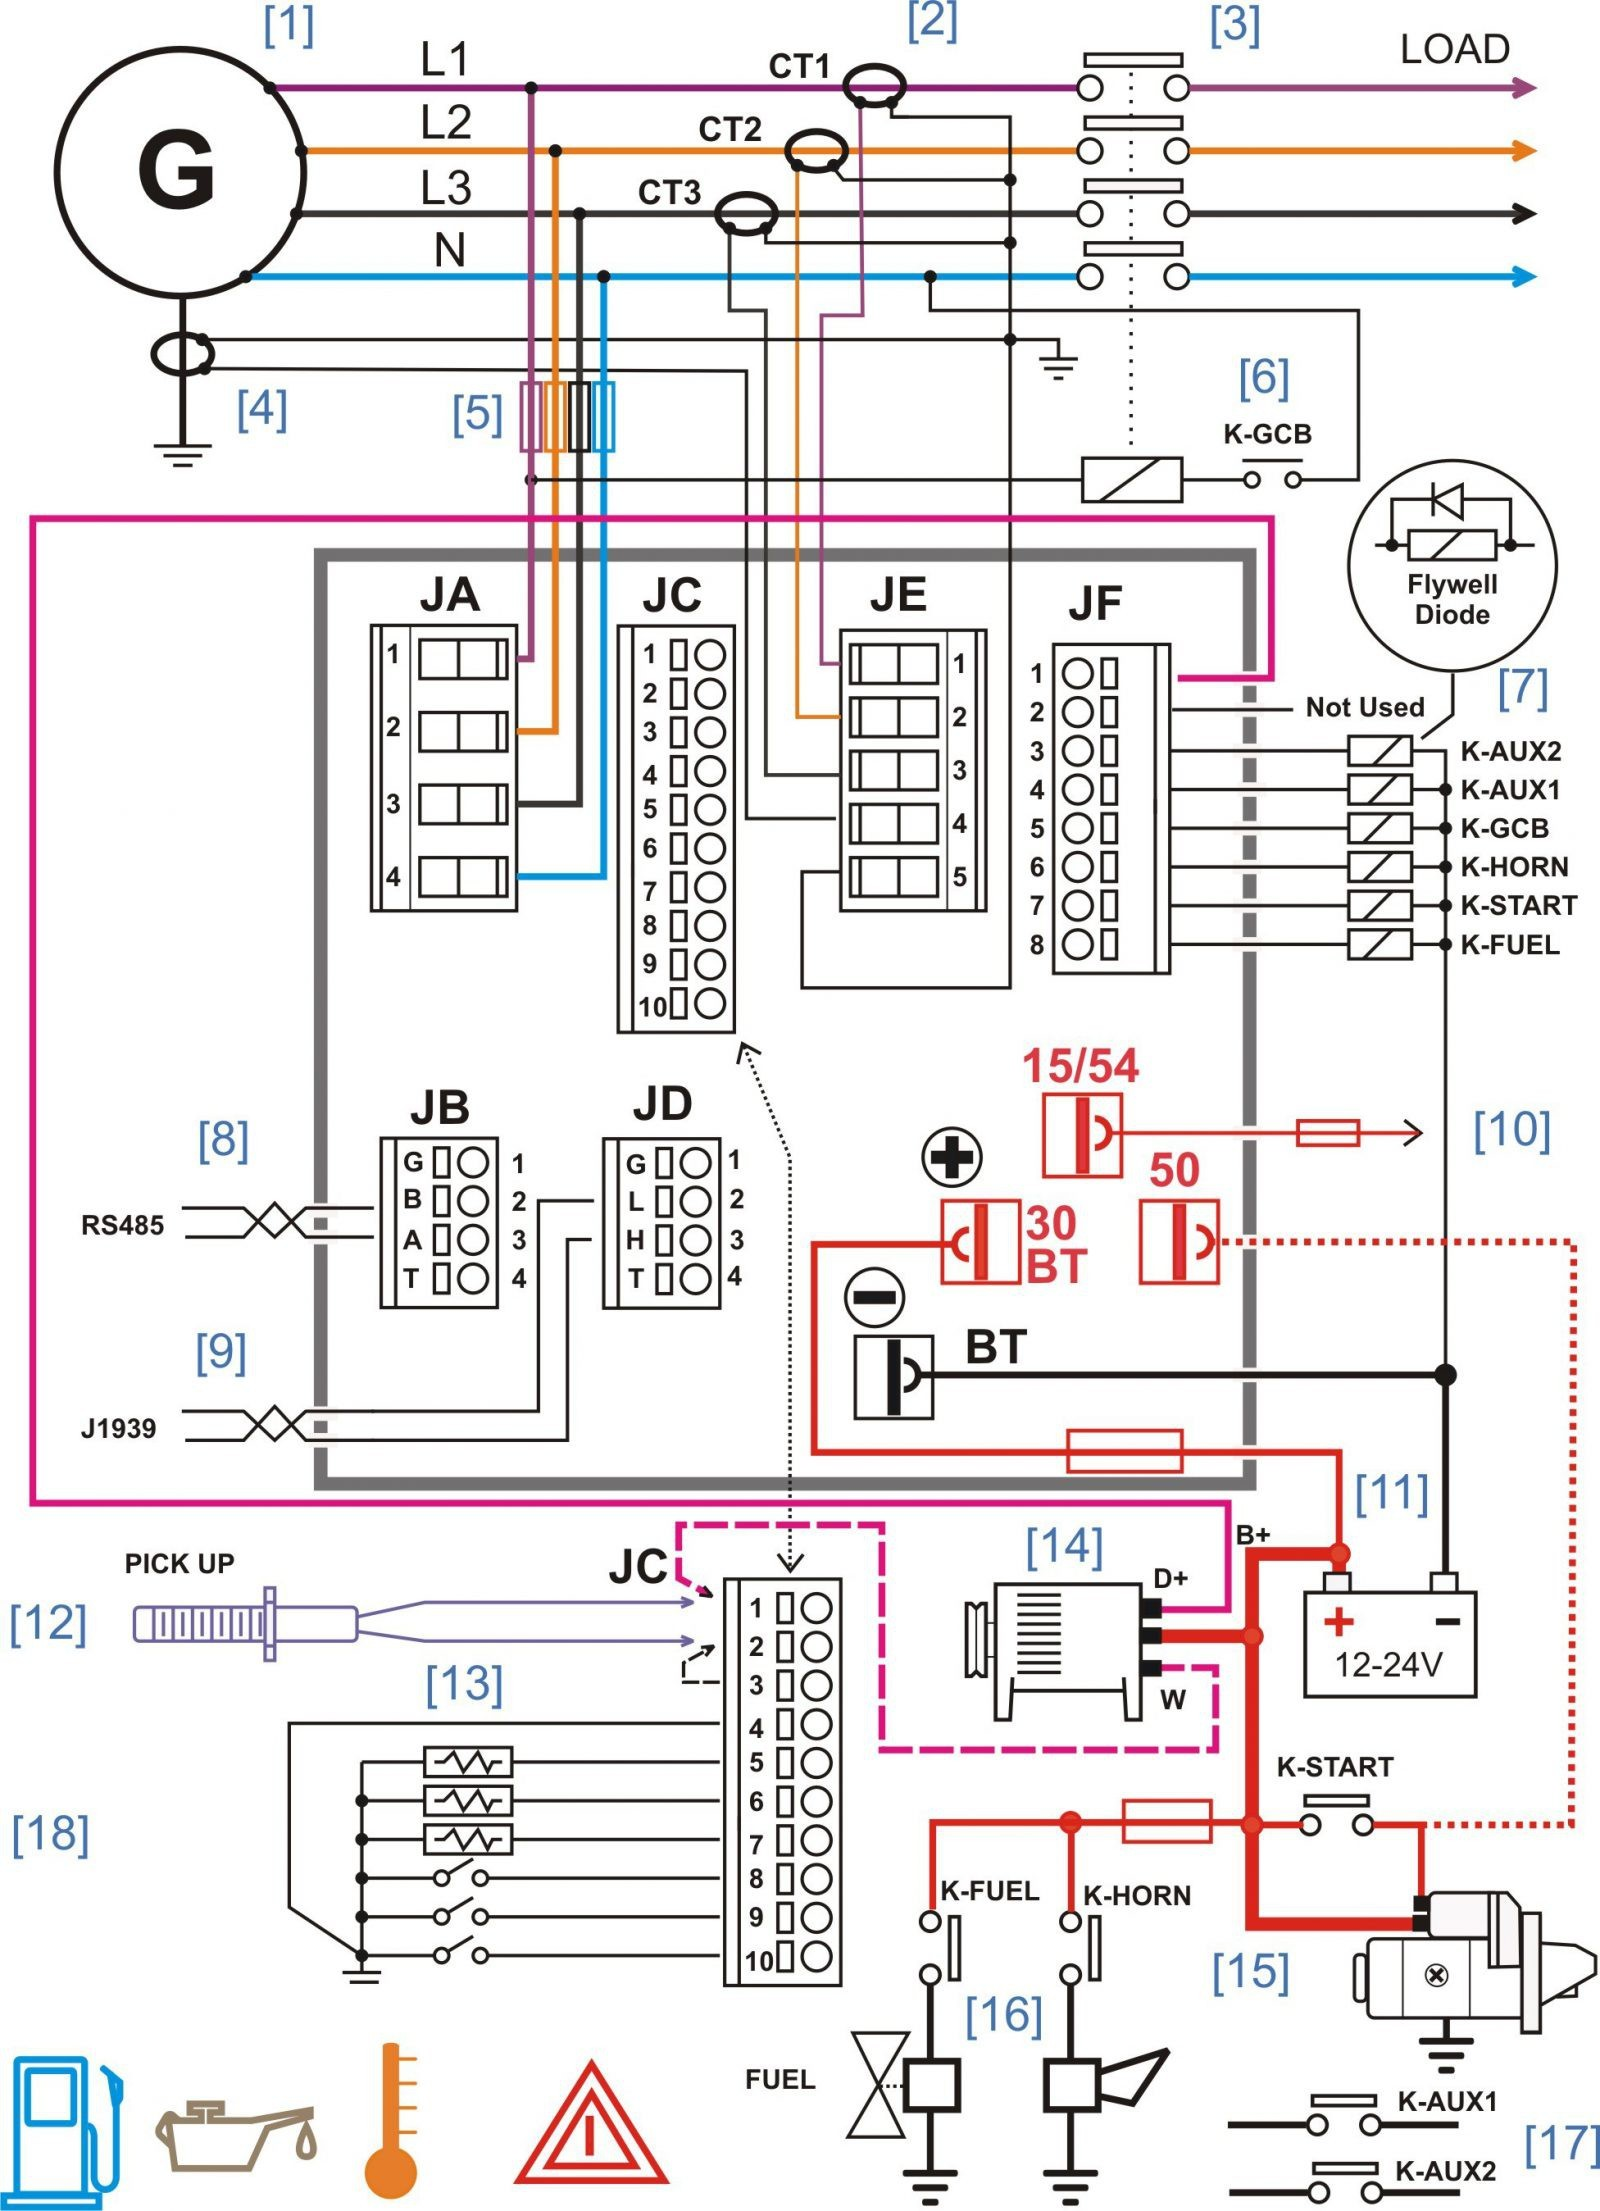 Car stereo system diagram car audio wiring diagram pioneer radio car stereo system diagram lovely car stereo wiring diagram diagram of car stereo system diagram car asfbconference2016 Gallery